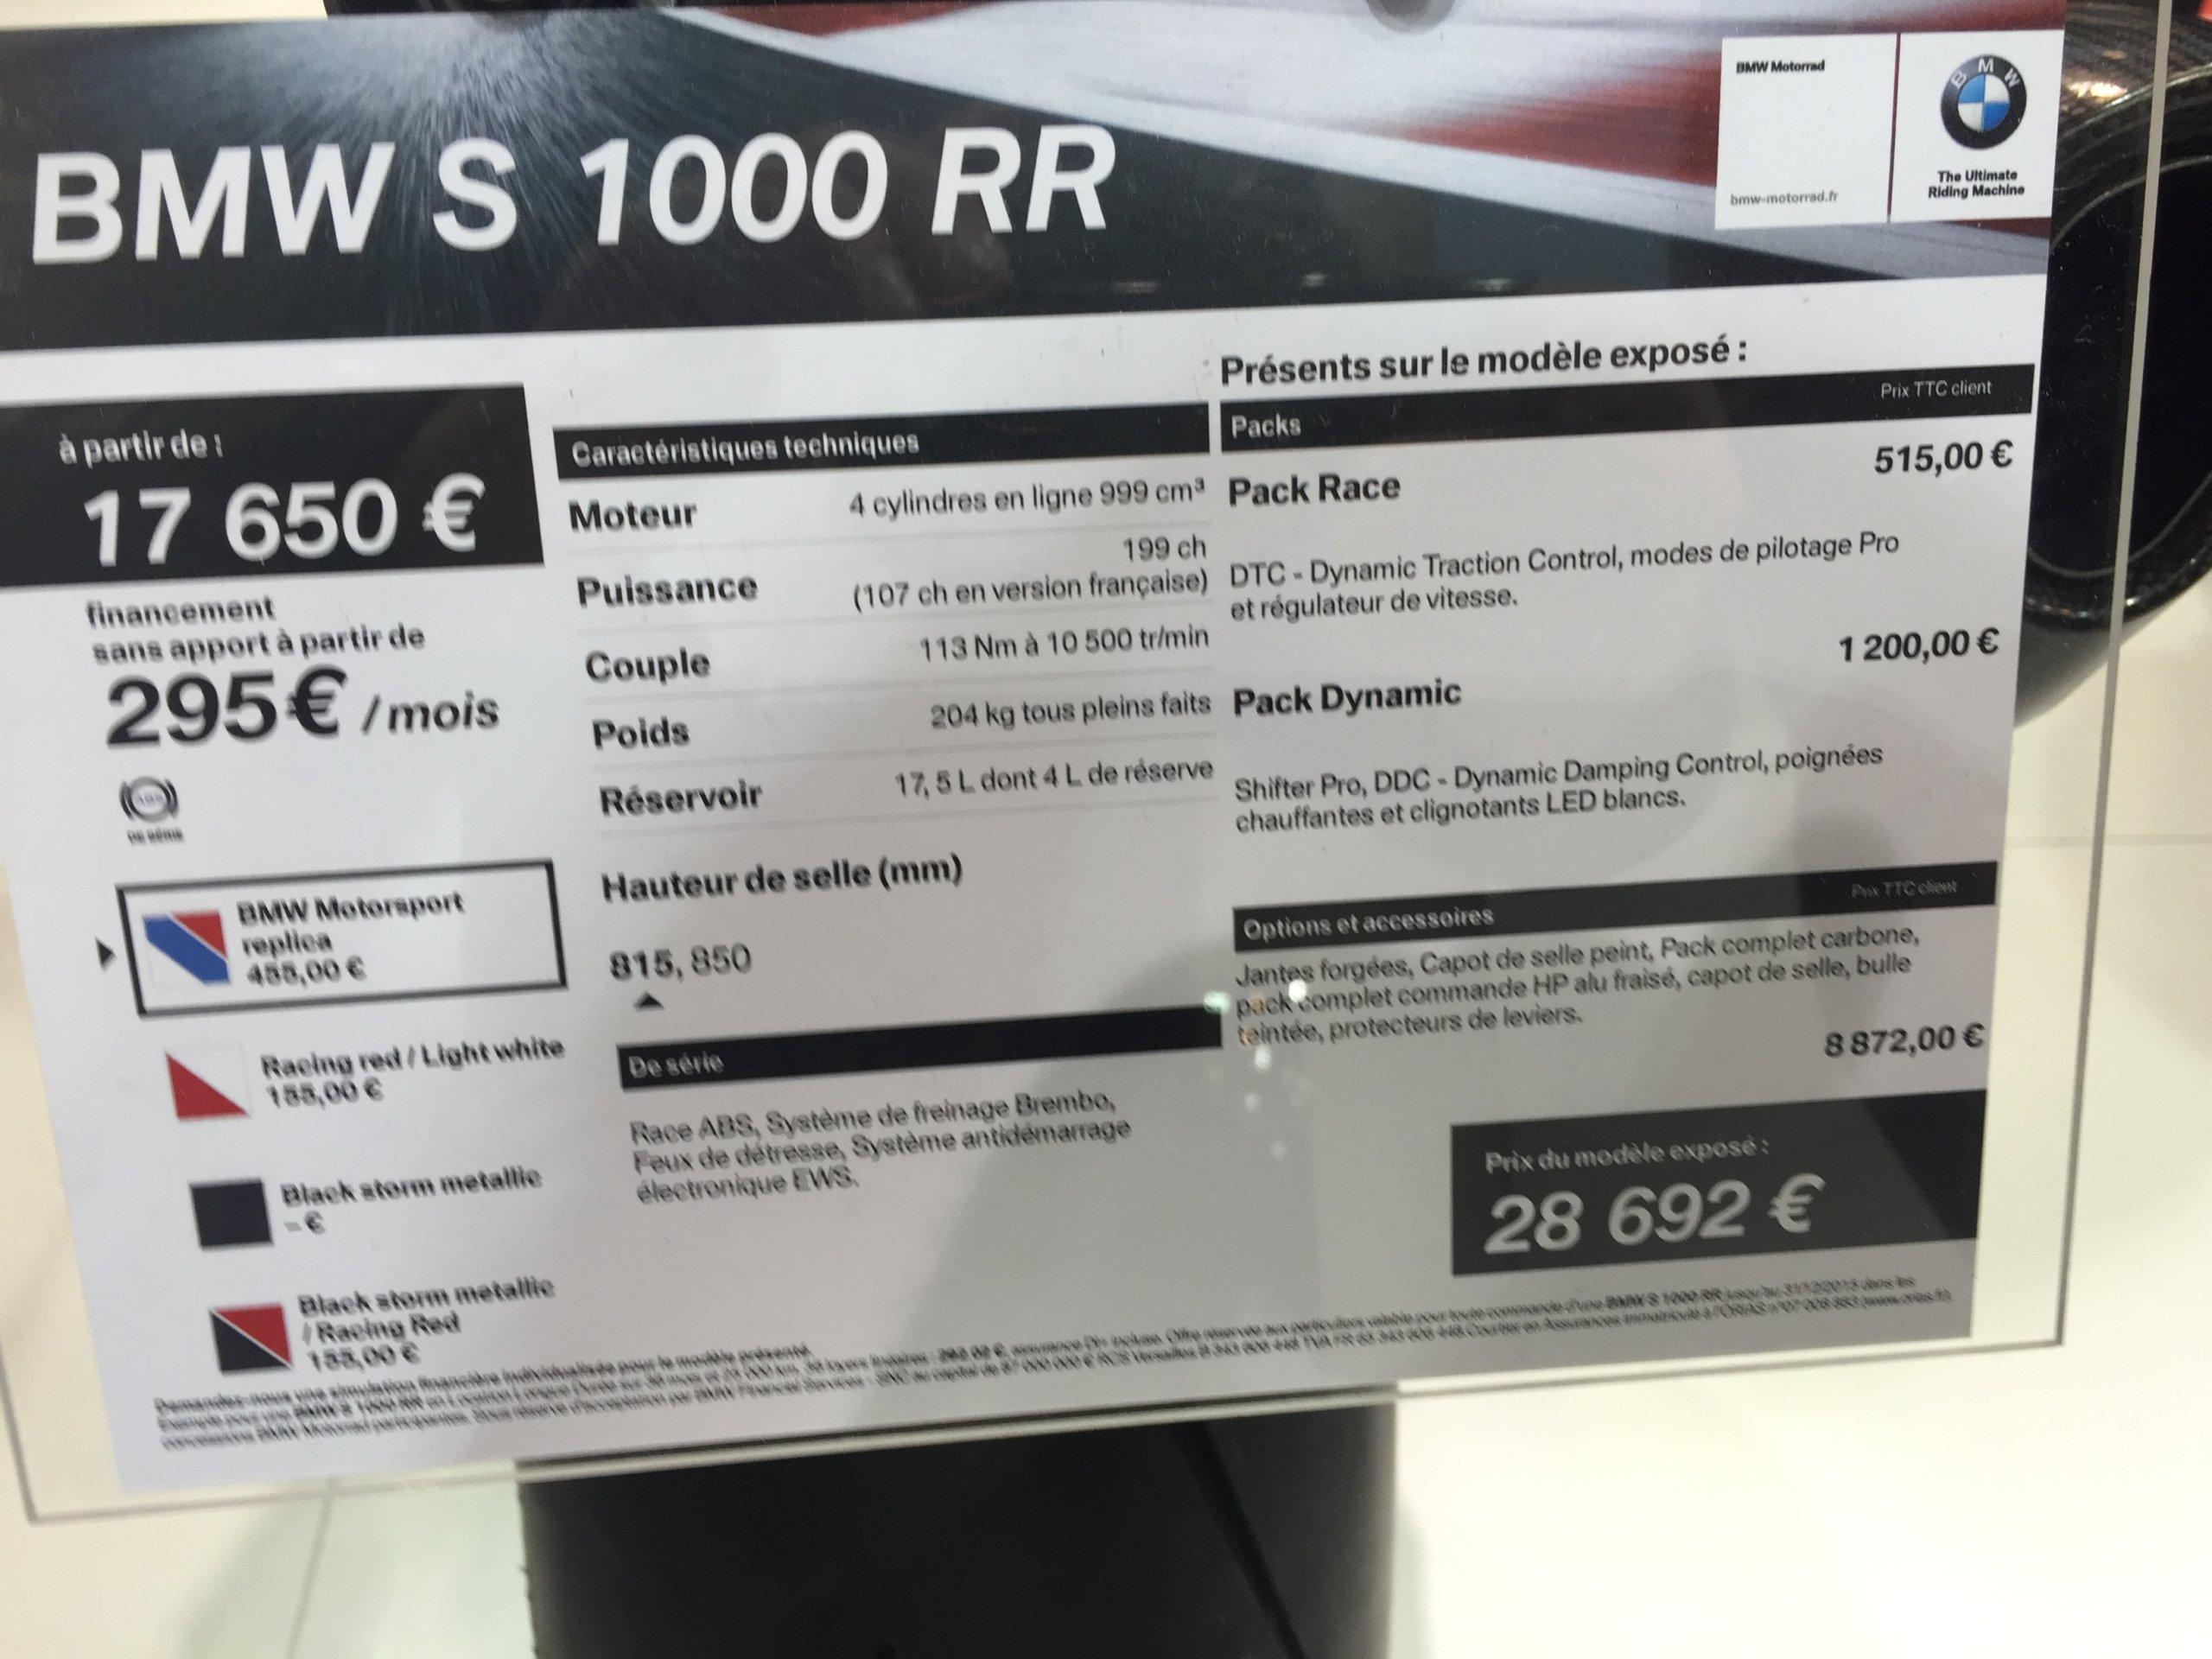 BMW S1000RR , Hp , Hp4 race  - Page 7 52f05da5-4bc8-4f48-9817-7be0af3c73bd